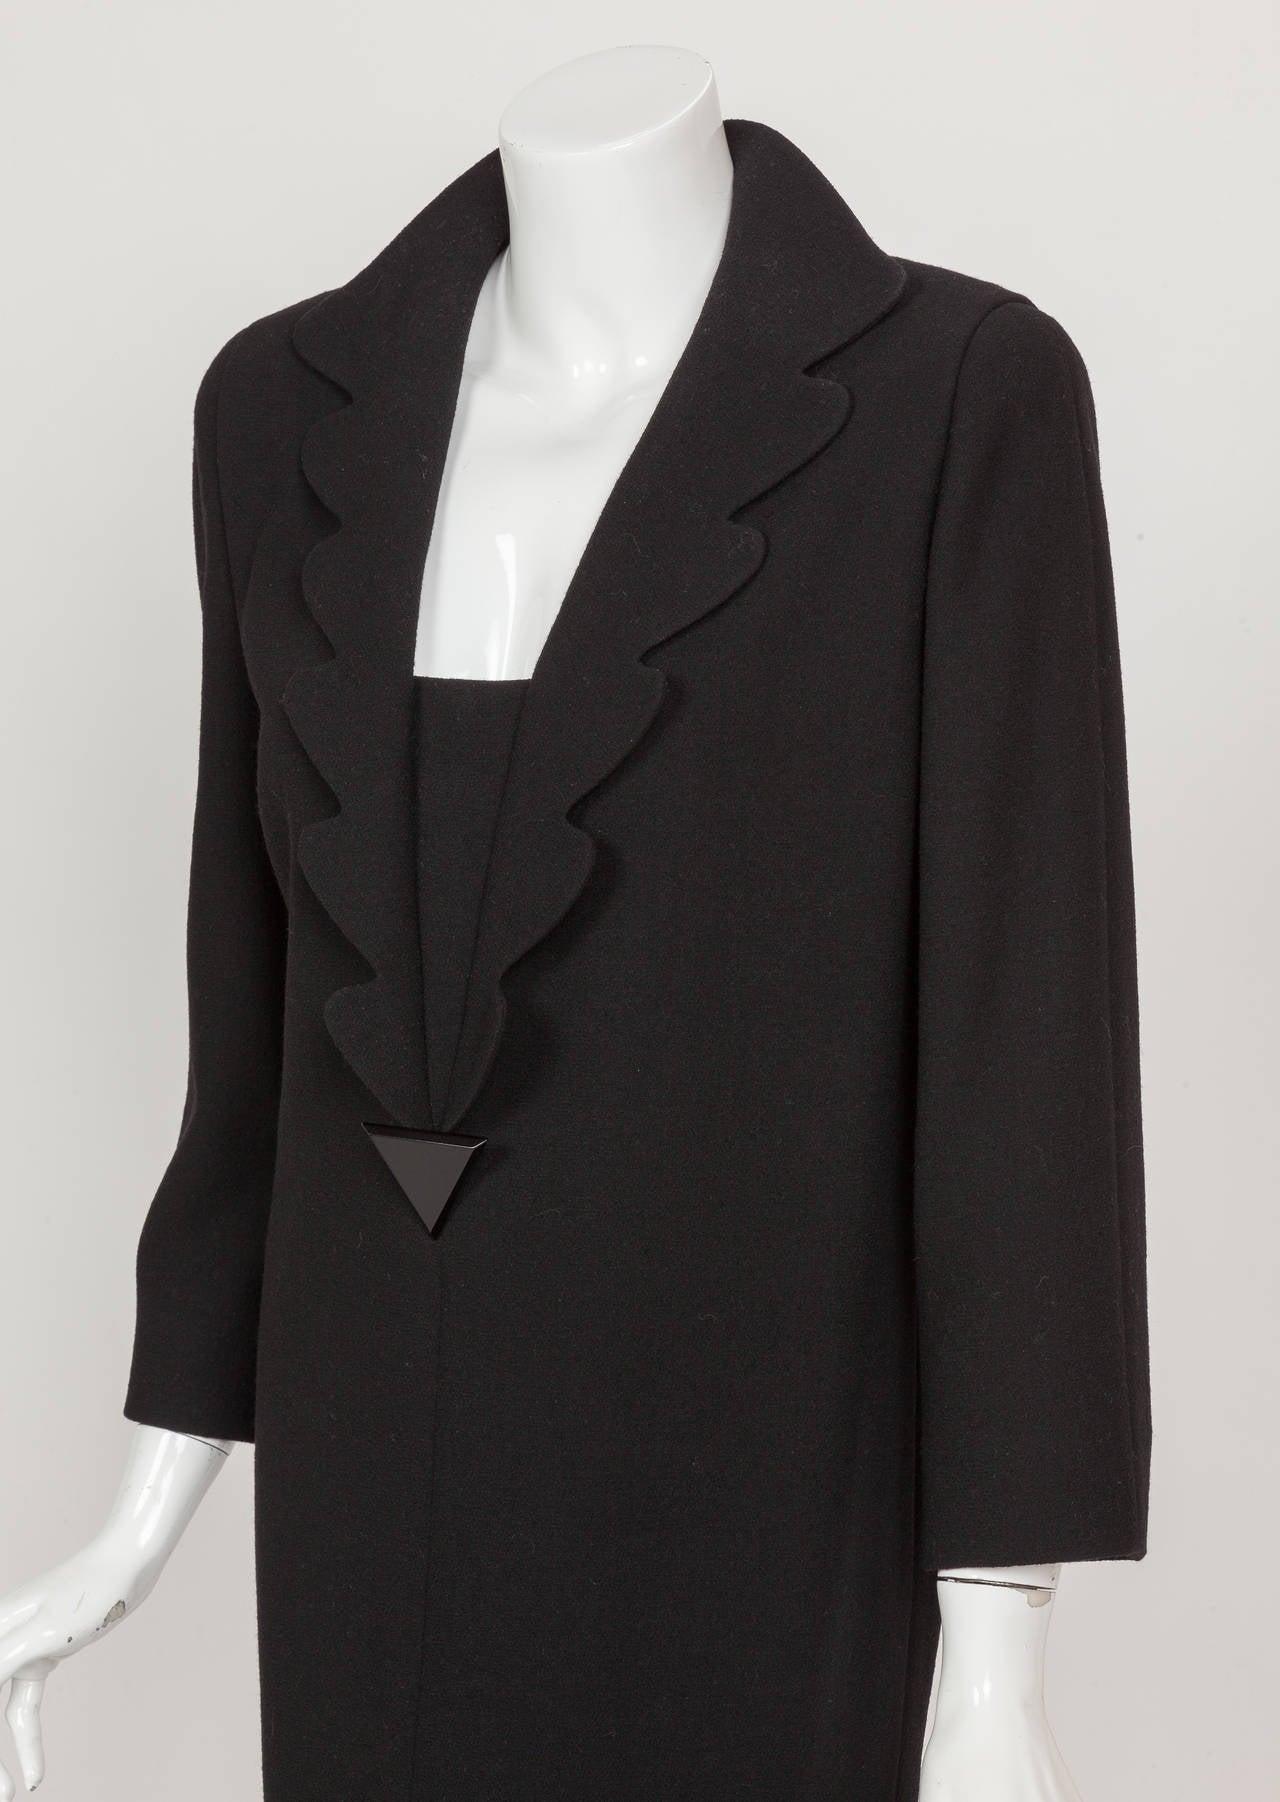 Pierre Cardin Haute Couture Wool Cocktail Dress w/Petalled Lapel ca. 1992 3